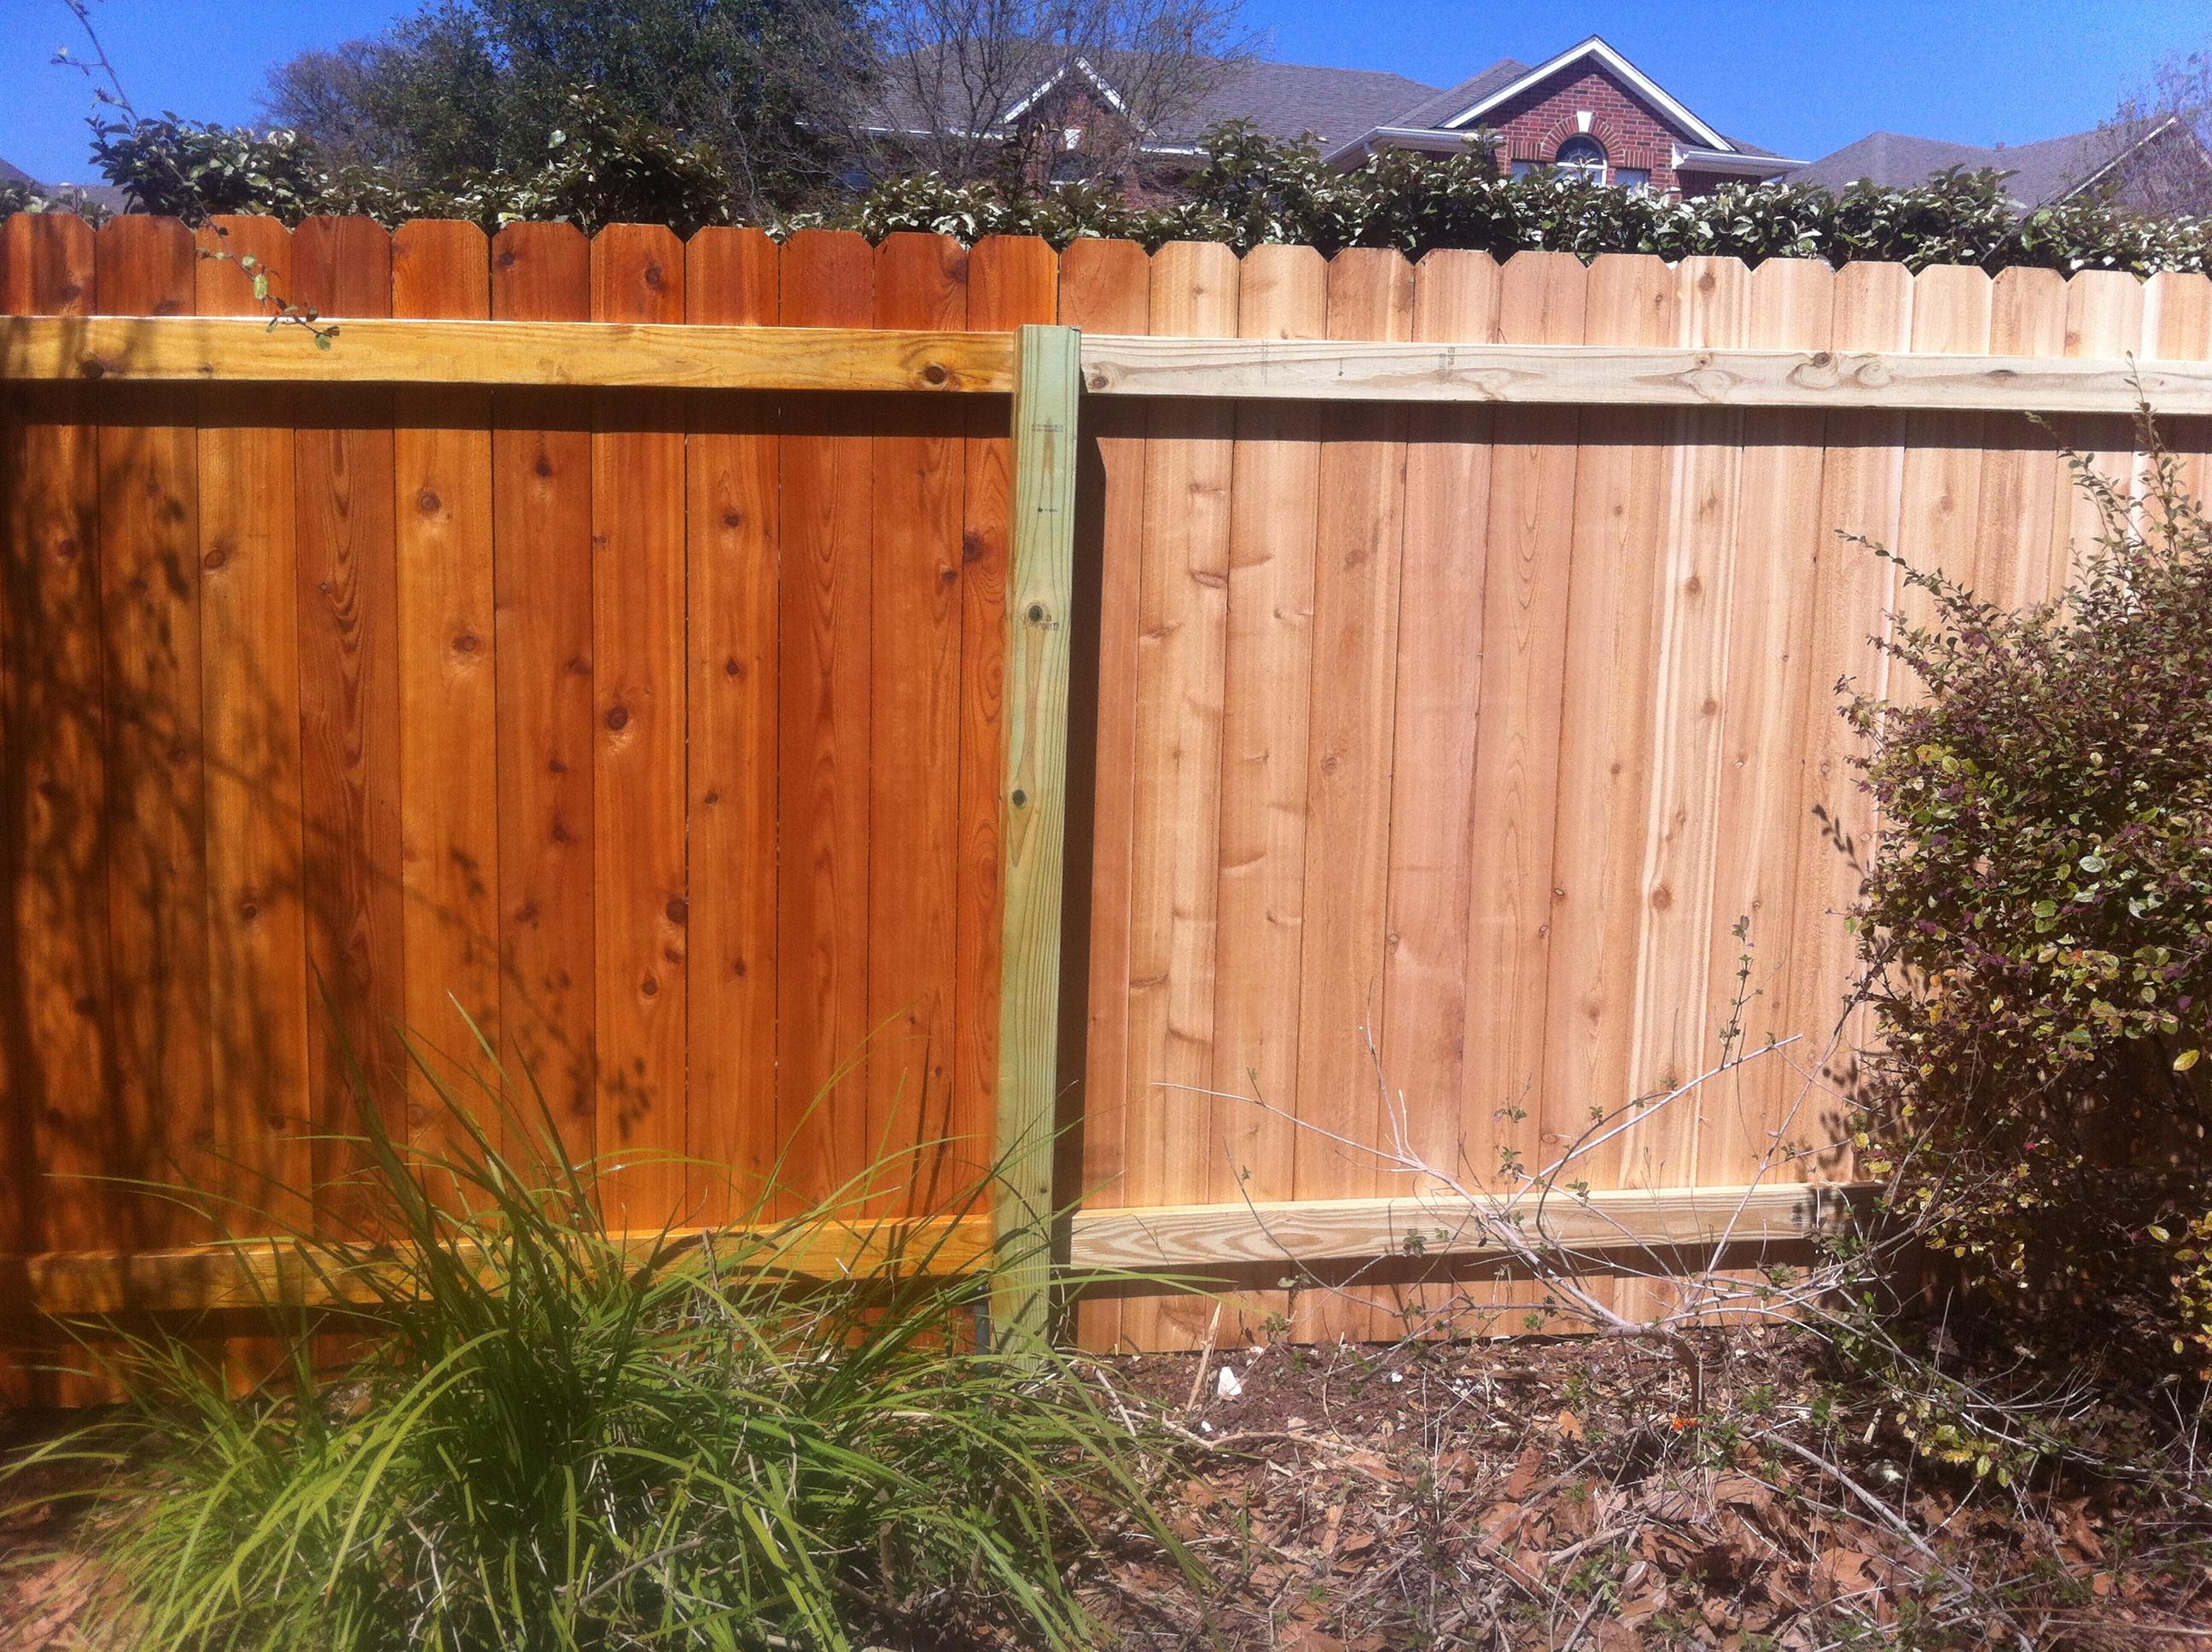 Cedar Fence Clear Sealer Fences Ideas with regard to size 2592 X 1936